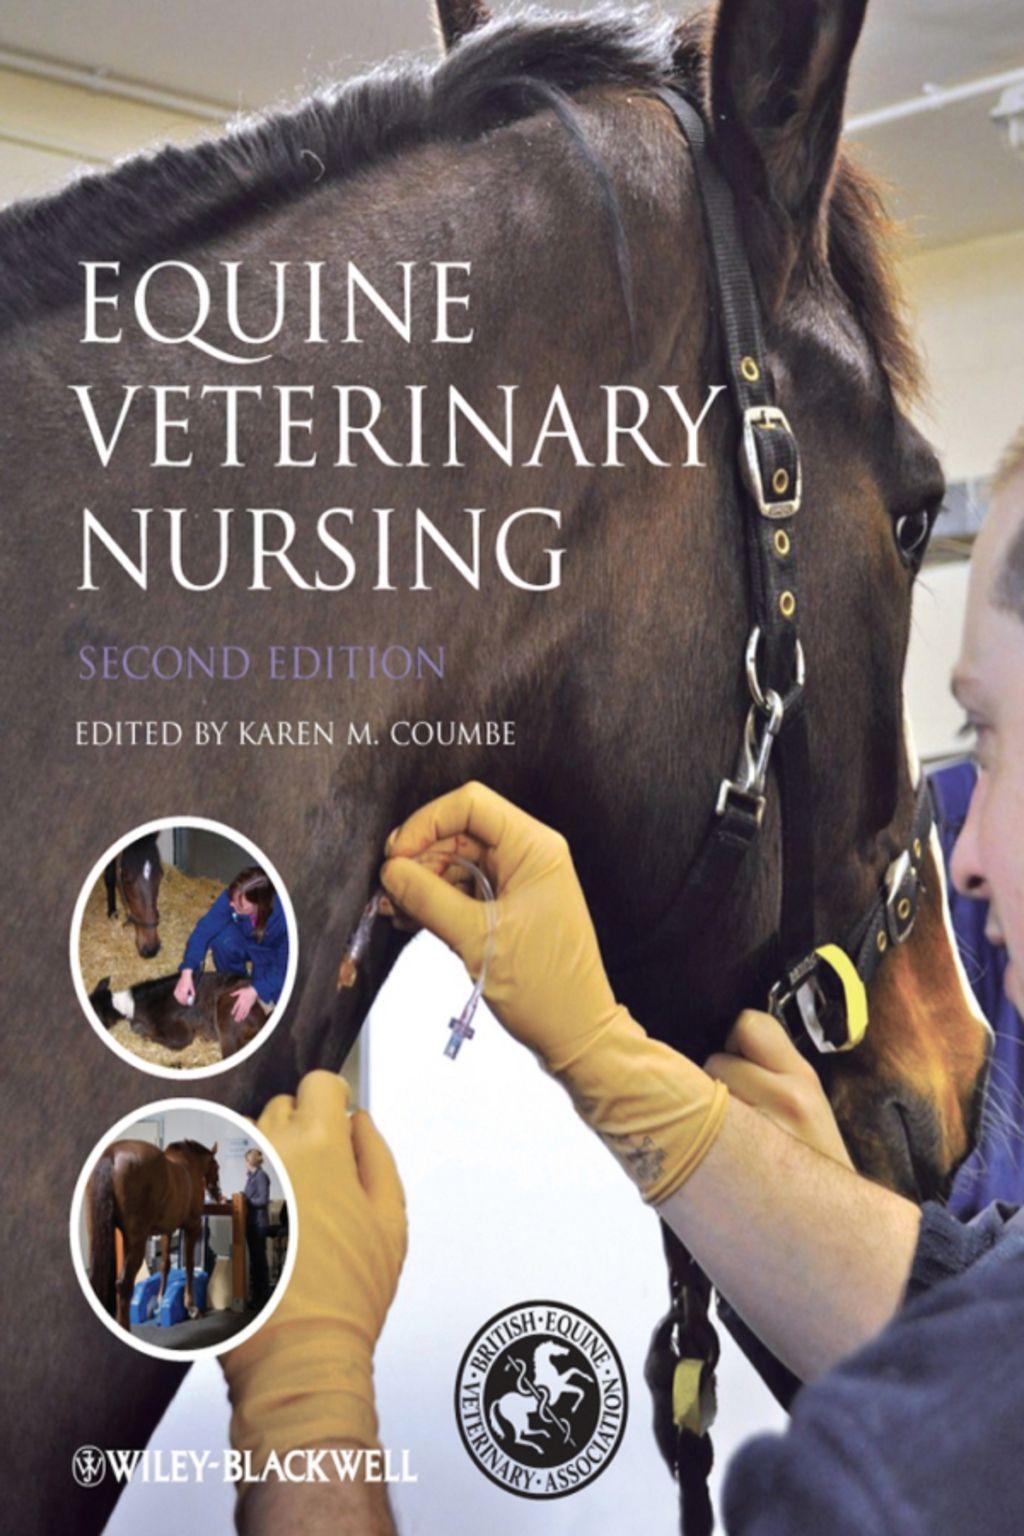 Equine Veterinary Nursing Ebook Equine Veterinary Veterinary Equine Veterinarian